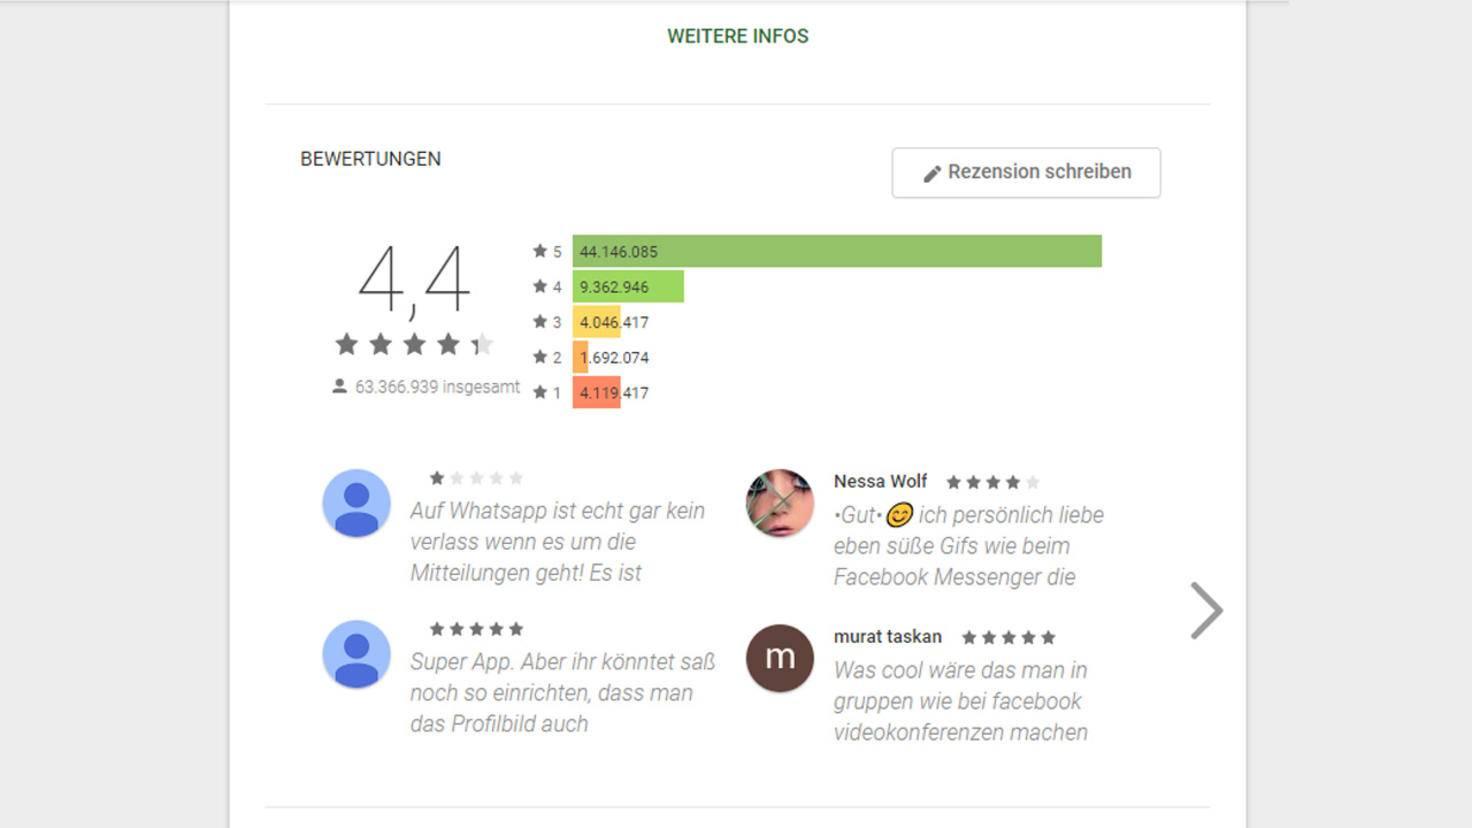 WhatsApp Bewertungen